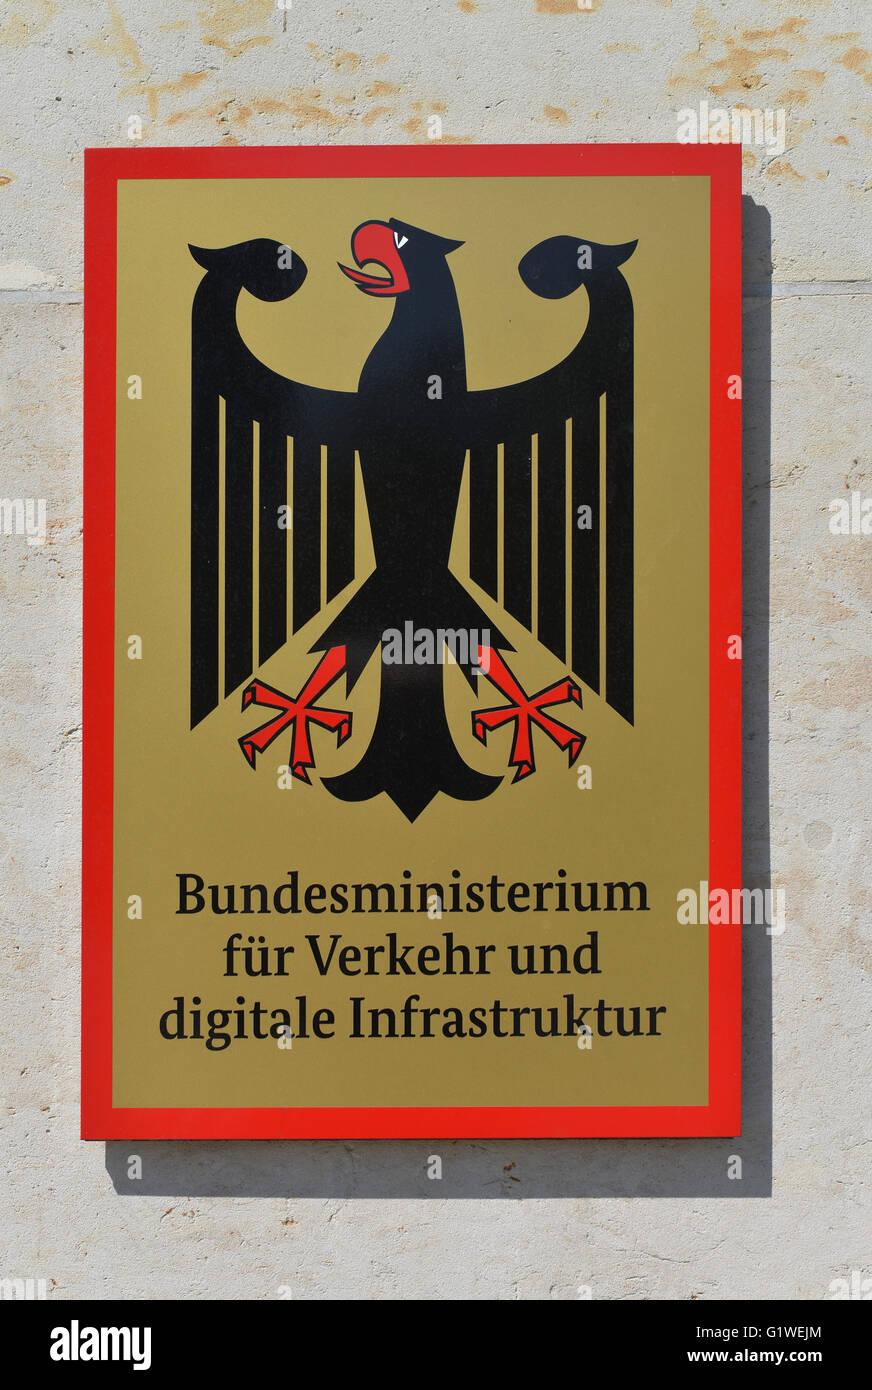 Tafel, Bundesministerium fuer Verkehr und Infrastruktur digitale, Invalidenstrasse, nel quartiere Mitte di Berlino, Immagini Stock